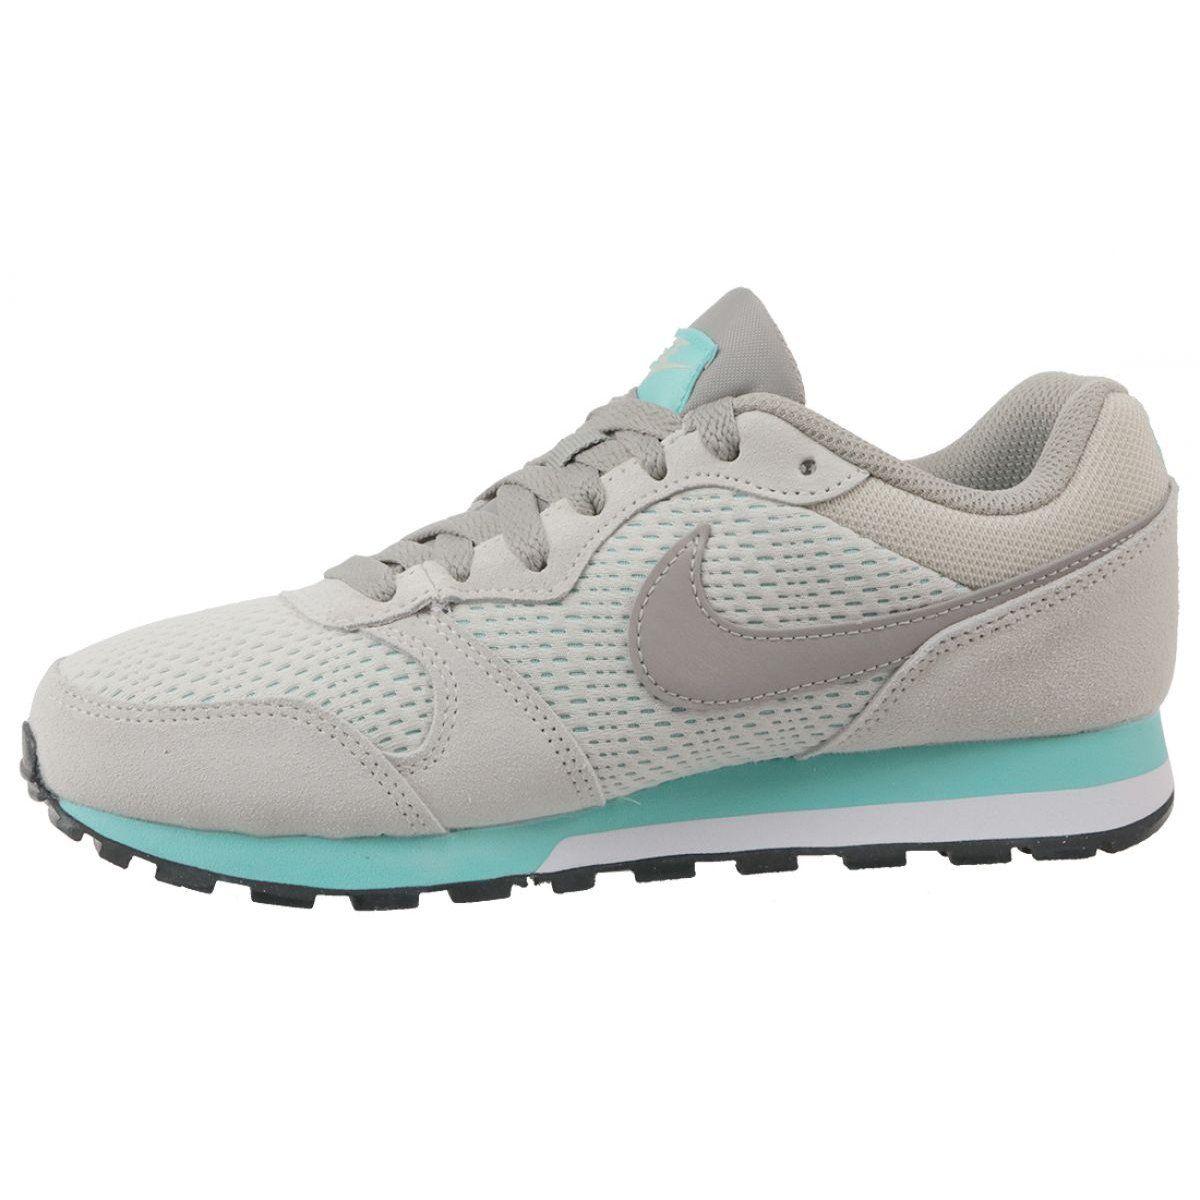 Buty Nike WMNS Air Max Thea damskie szare 599409030 ▷ Sklep Sizeer